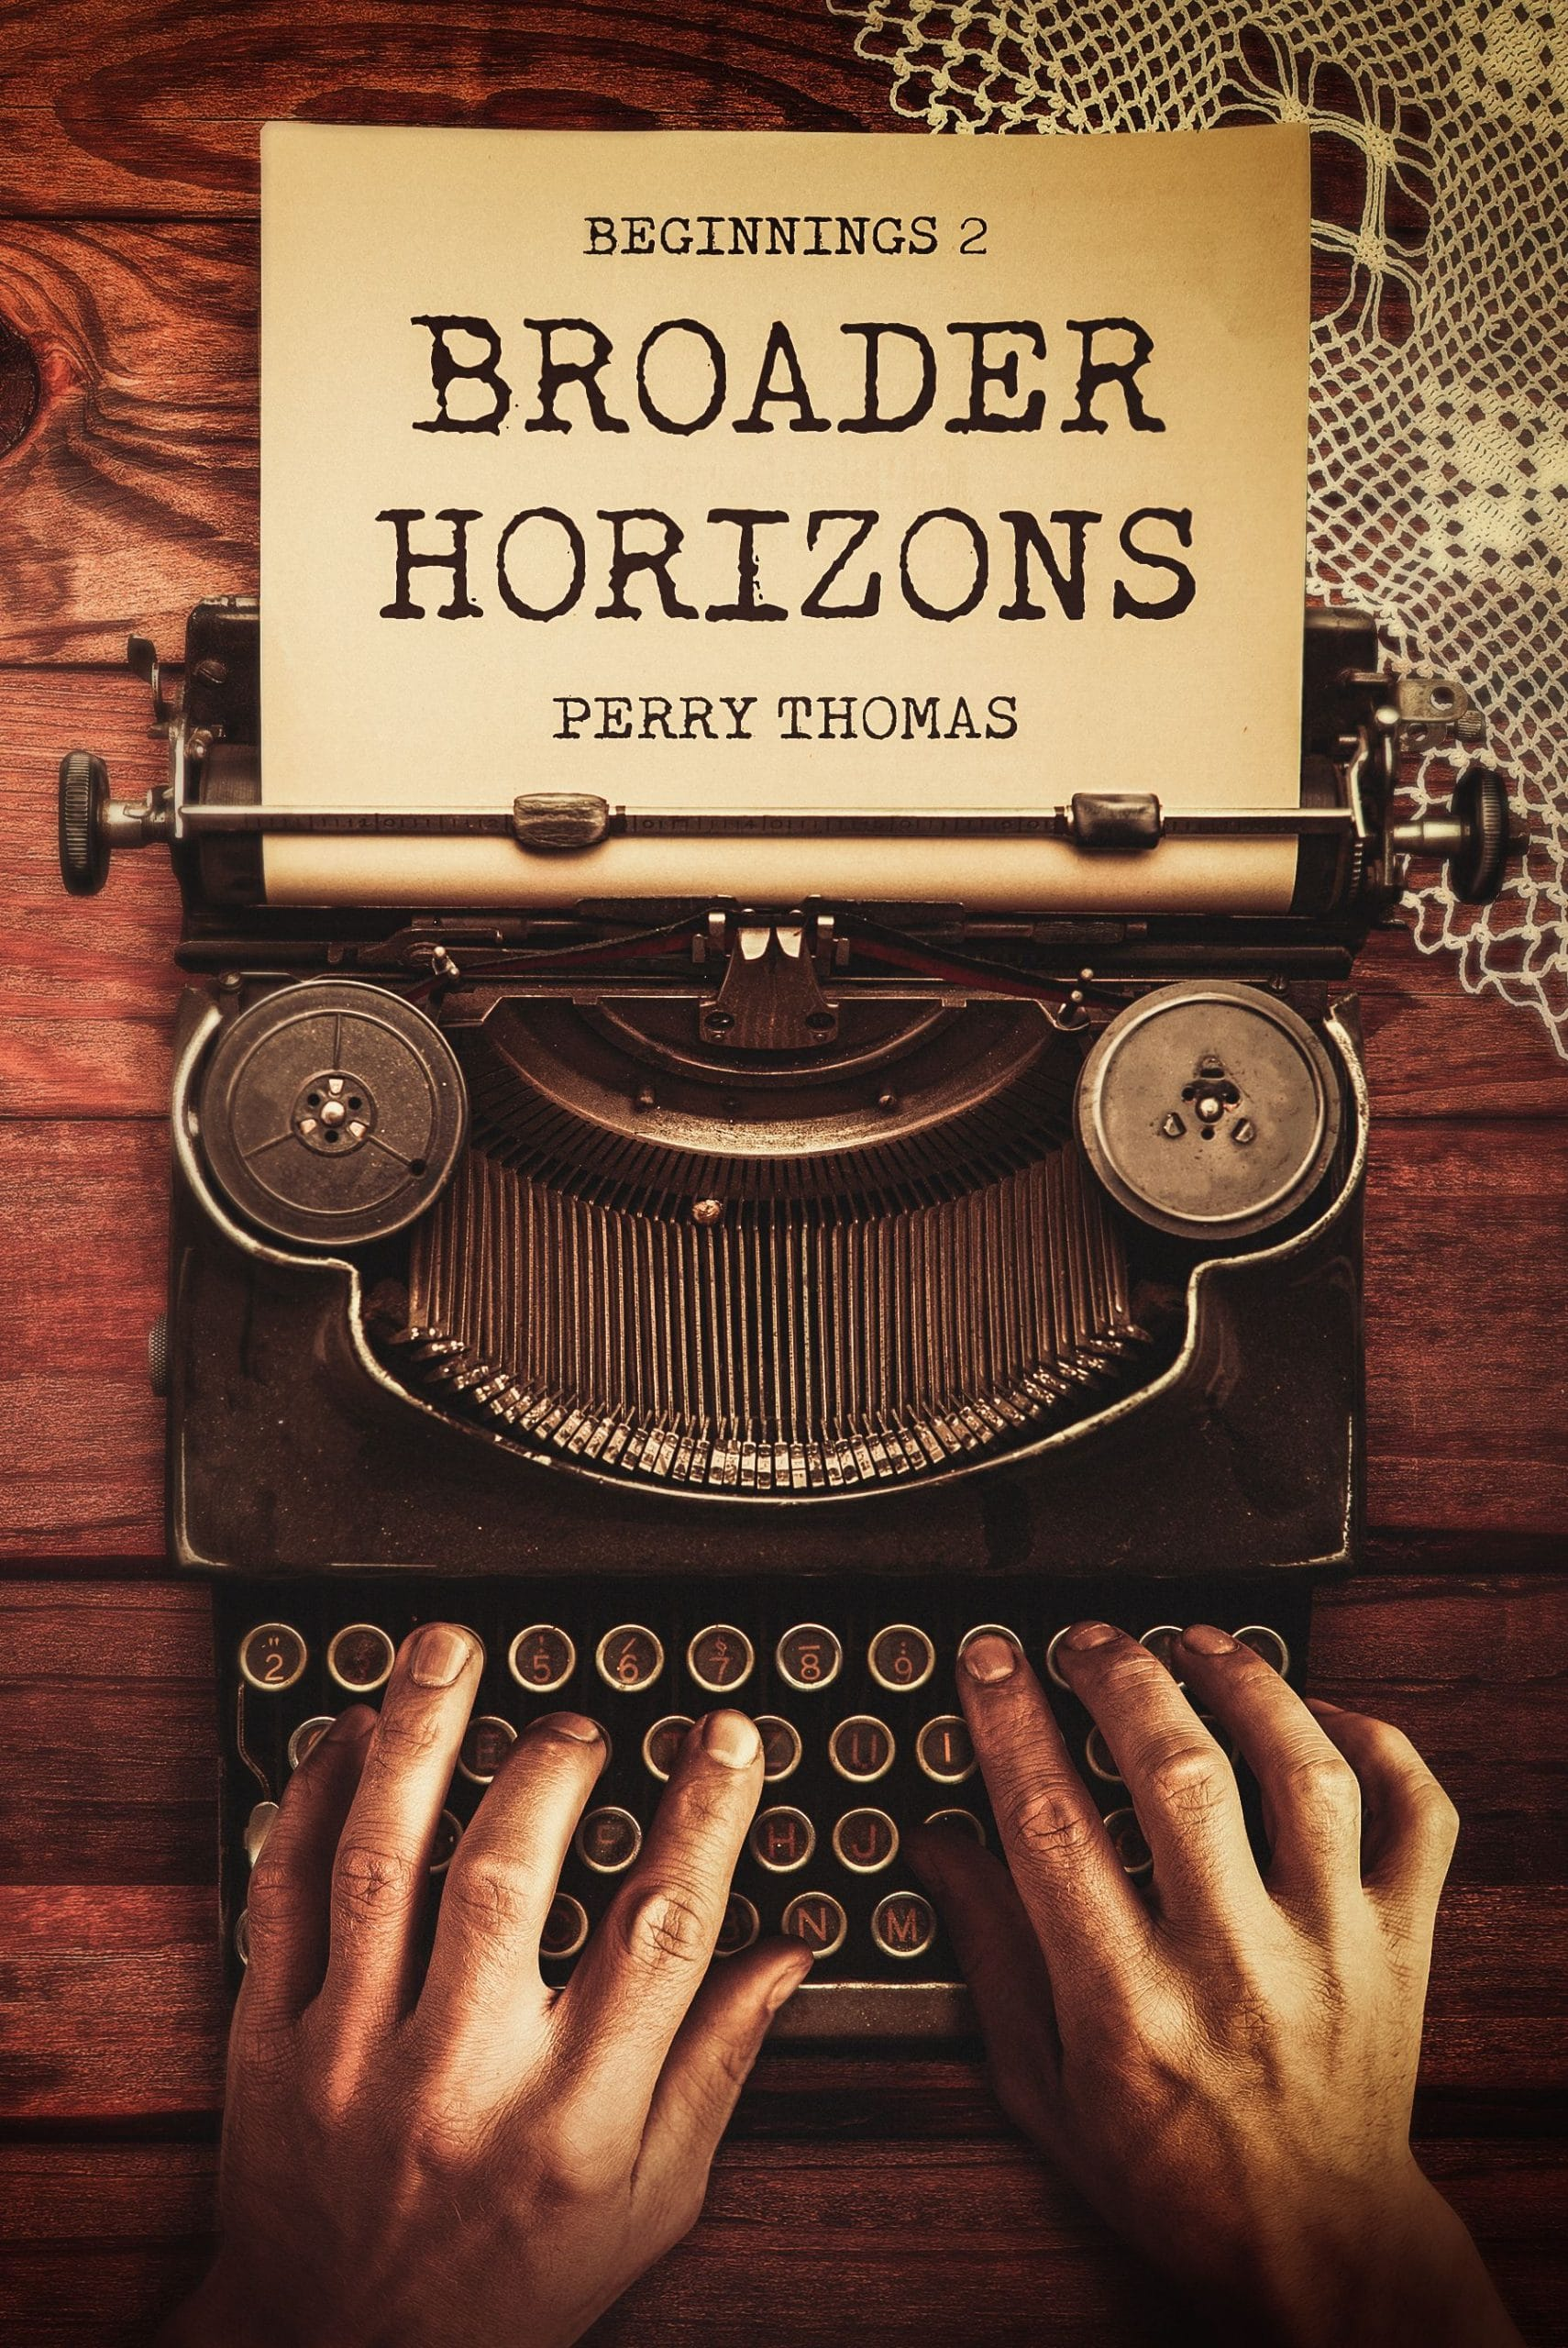 clever book cover idea for non-fiction